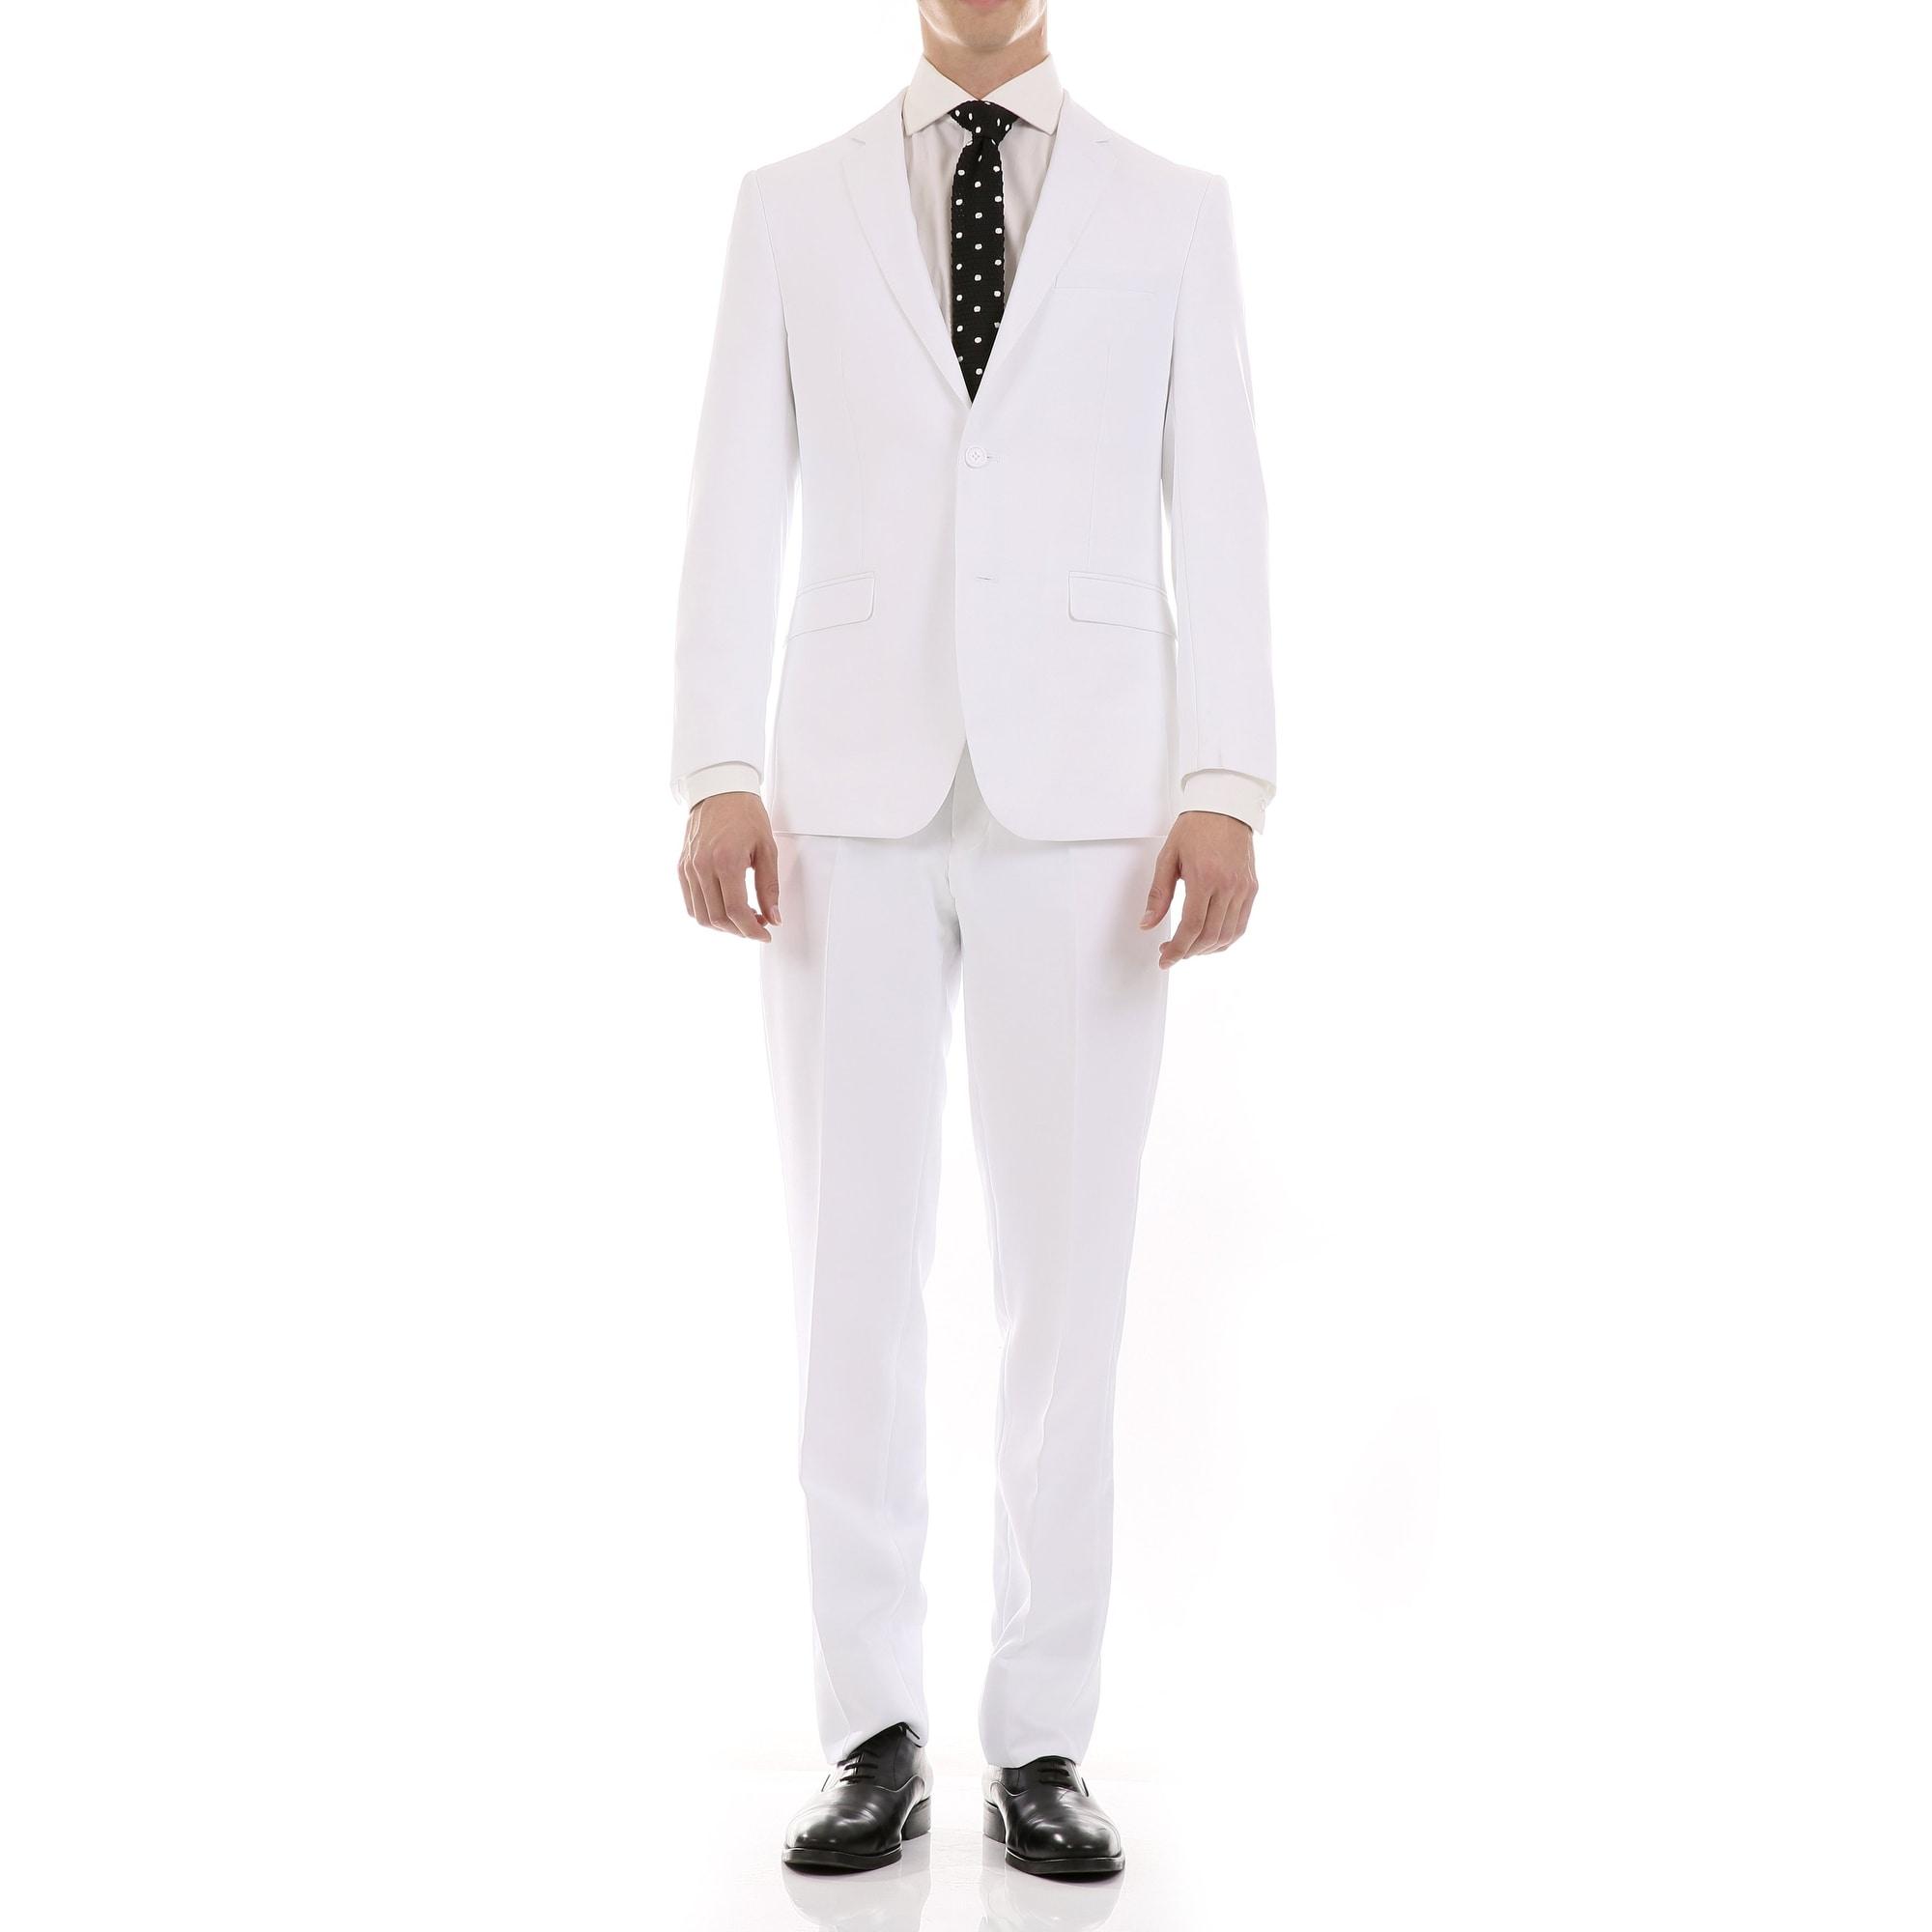 Ferrecci Mens Oslo Slim Fit Notch Lapel 2 Piece Suit with Matching Flat-Front Dress Pants